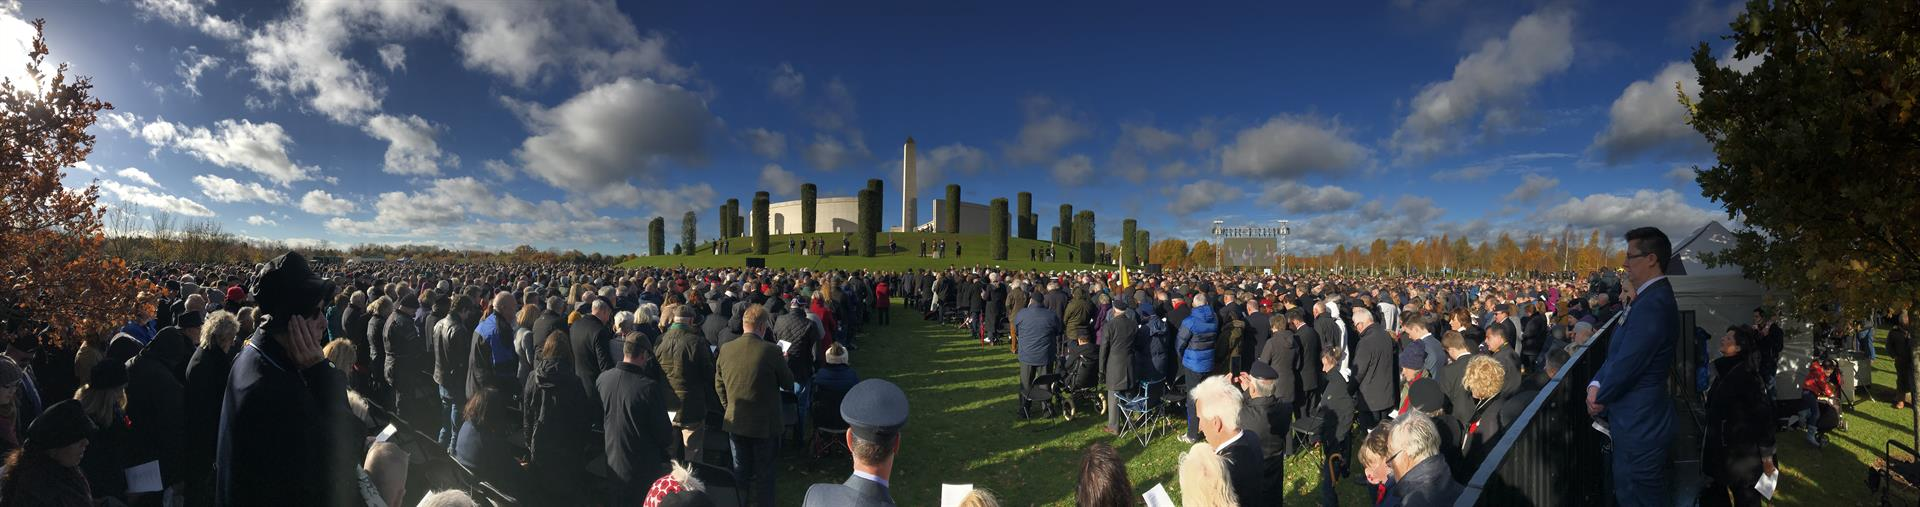 Image of crowd at Armistice 100 service